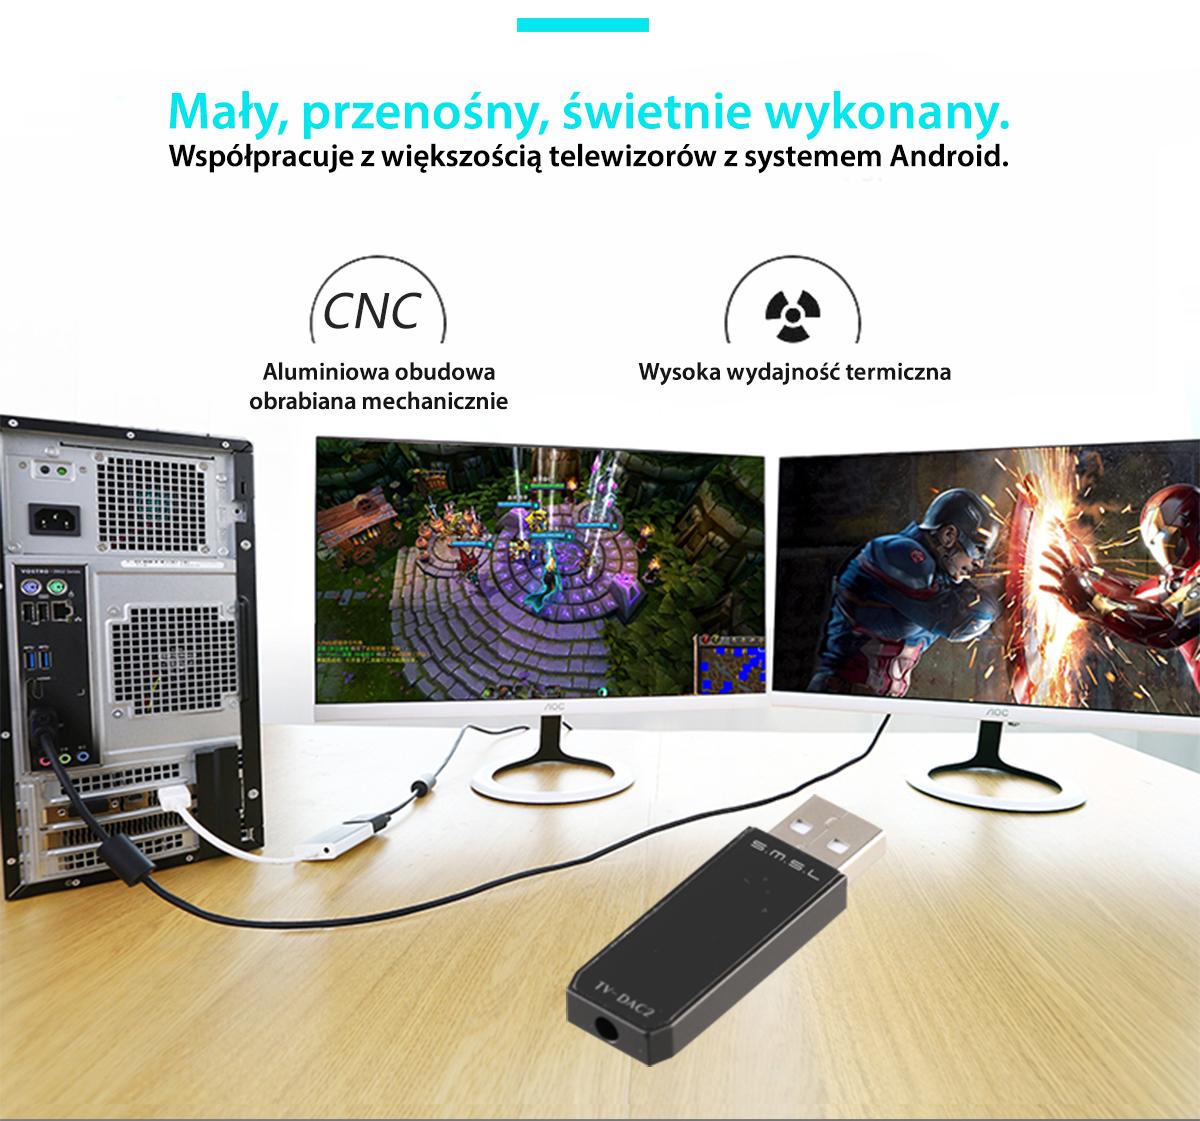 SMSL TV-DAC2